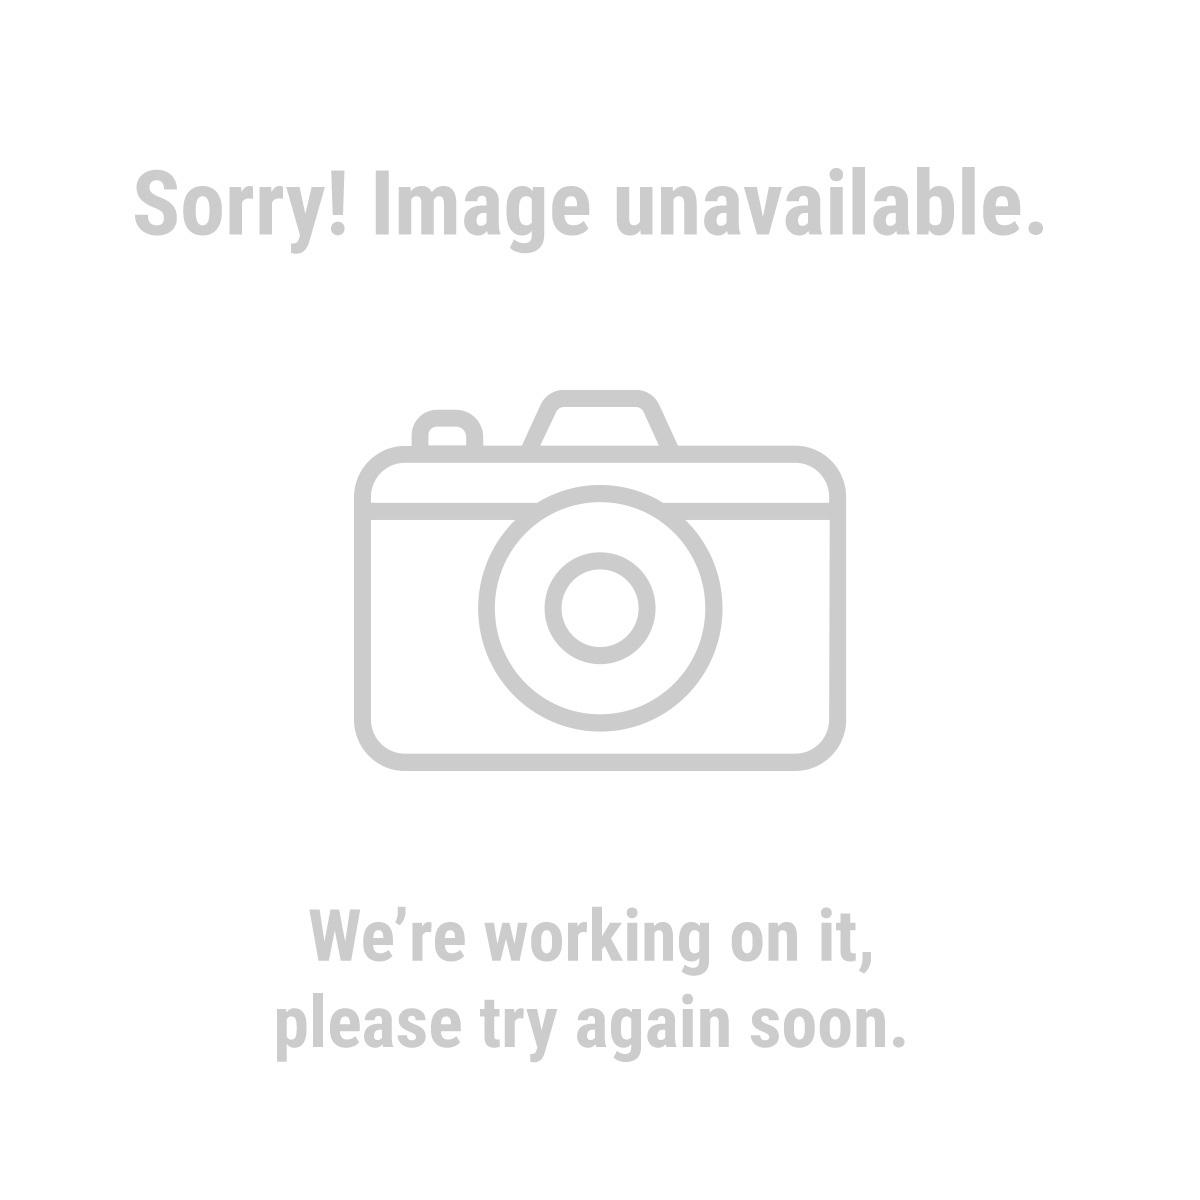 Gorilla 96284 Fast Cure Gorilla Glue